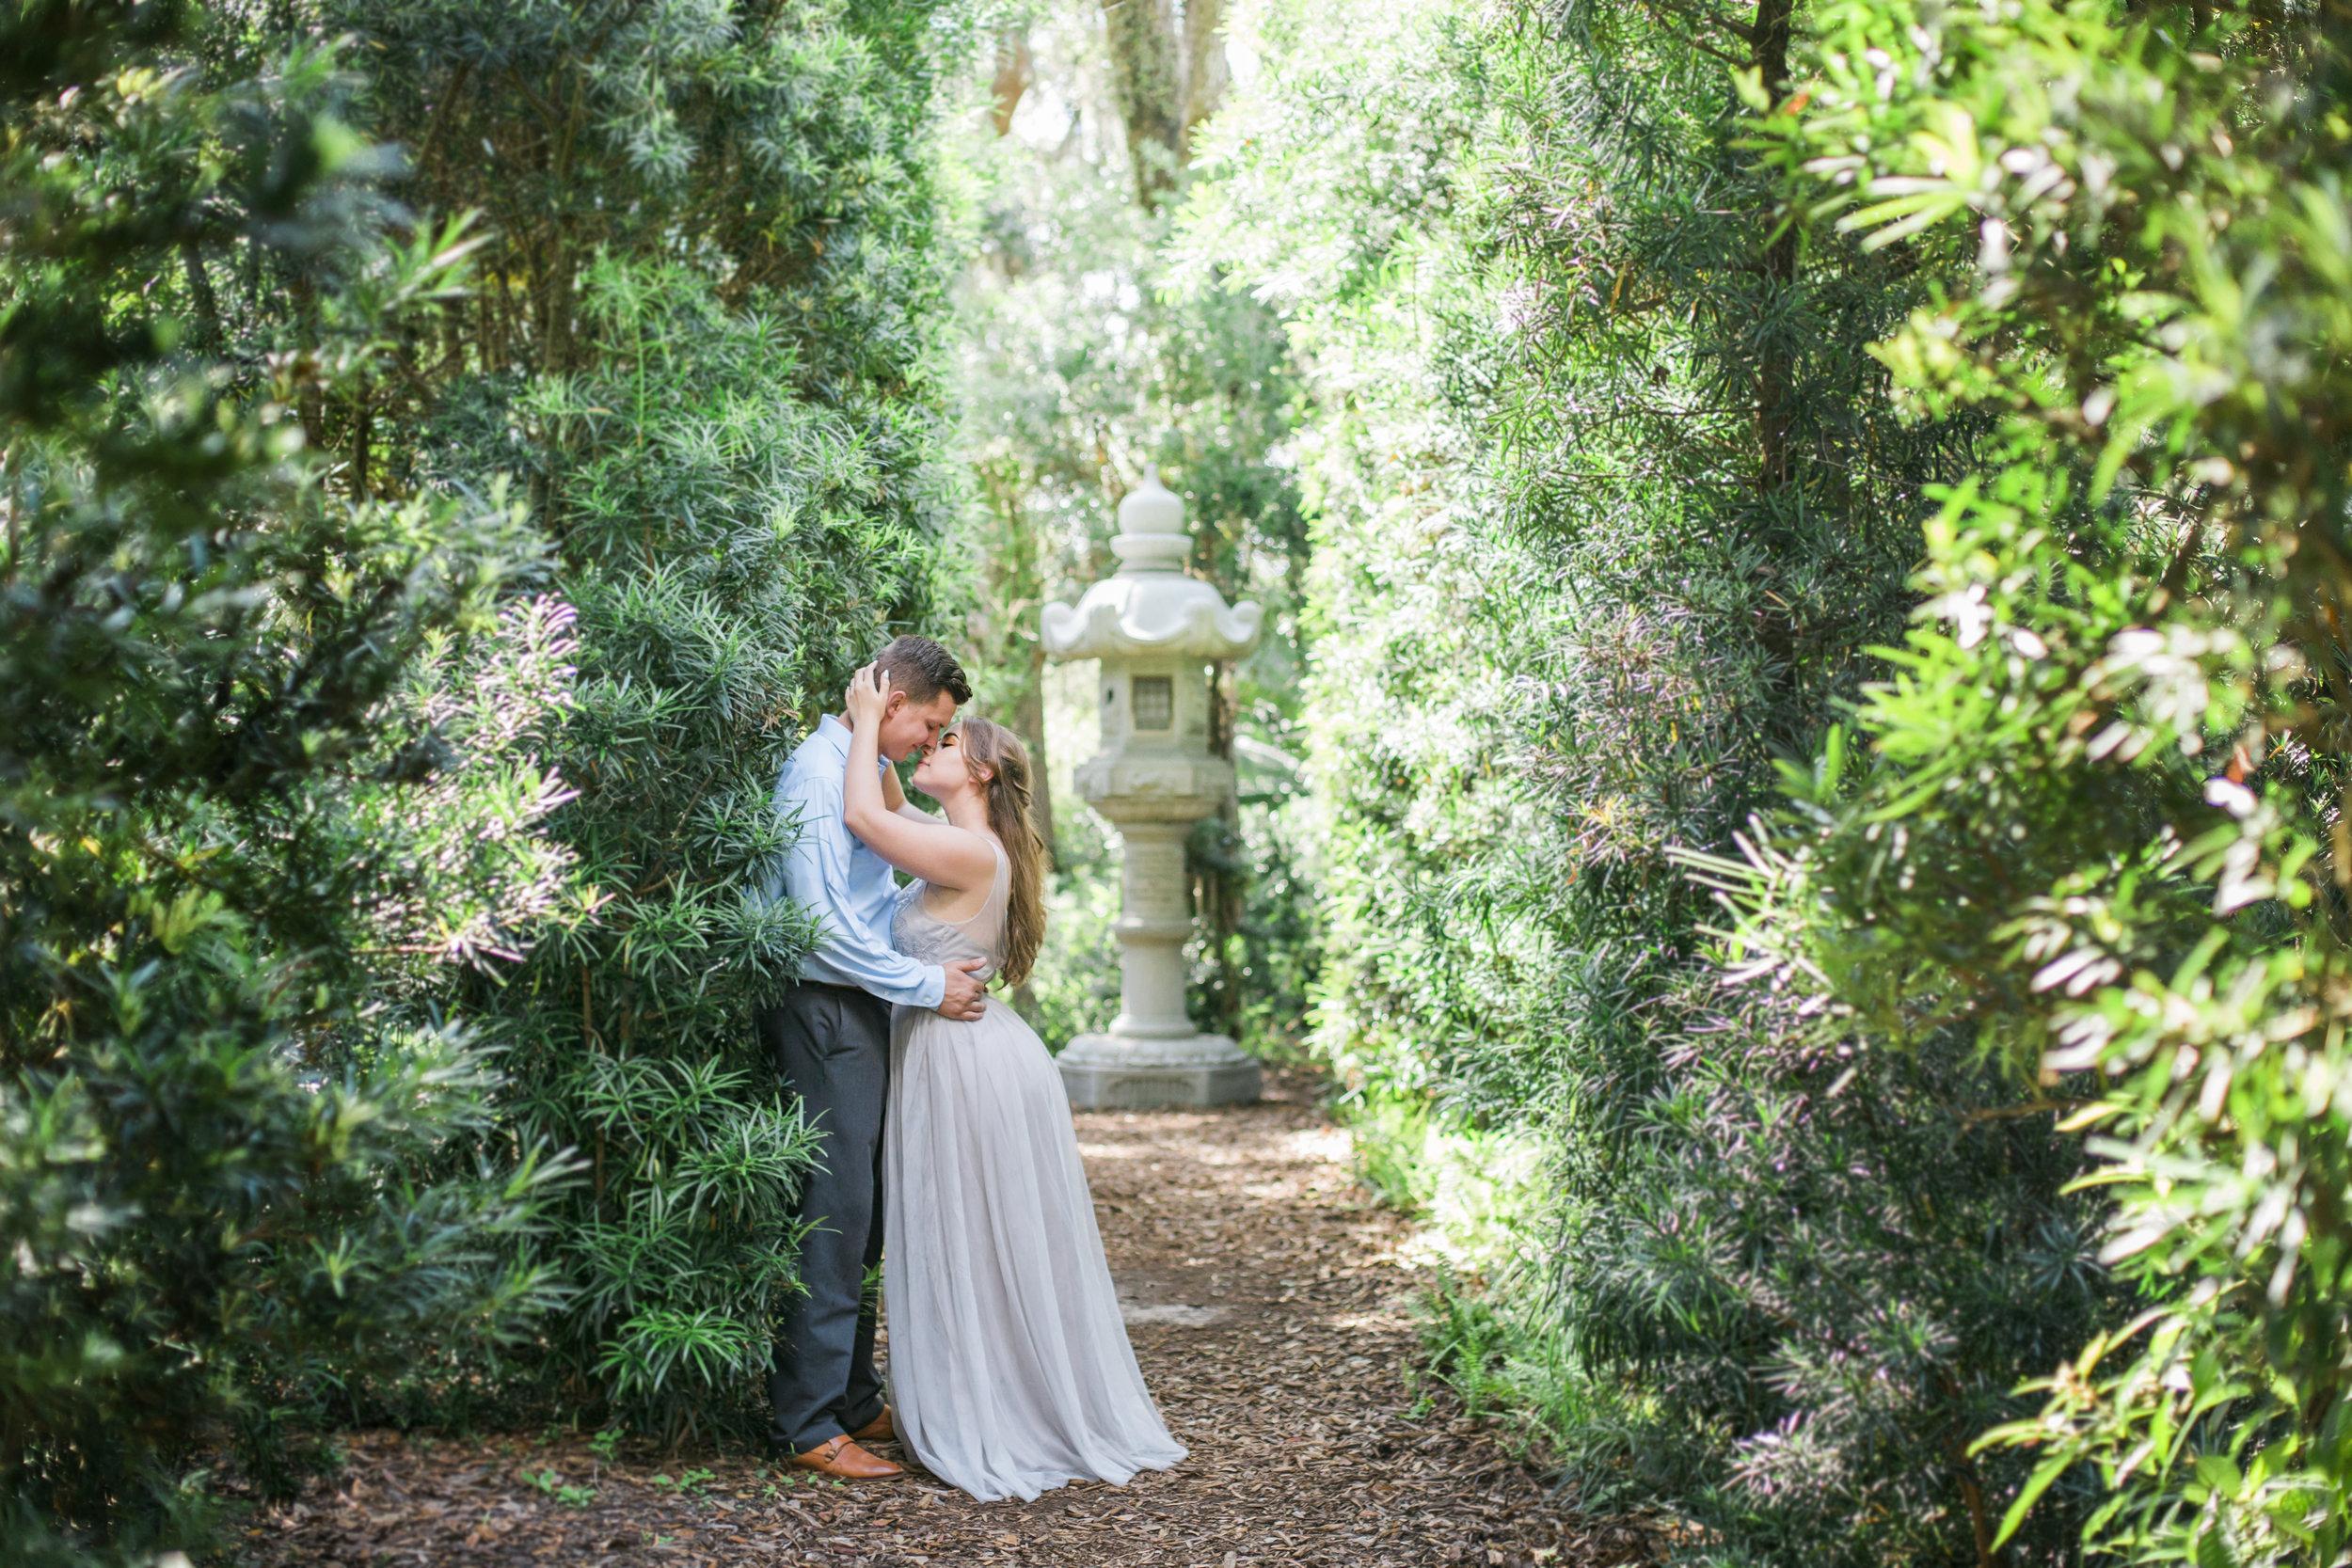 Scarlett + Derek - Bok Tower Gardens Wedding Photographer - Bok Tower Gardens Engagement Session - Preview Photos - Emily & Co. Photography (20).jpg